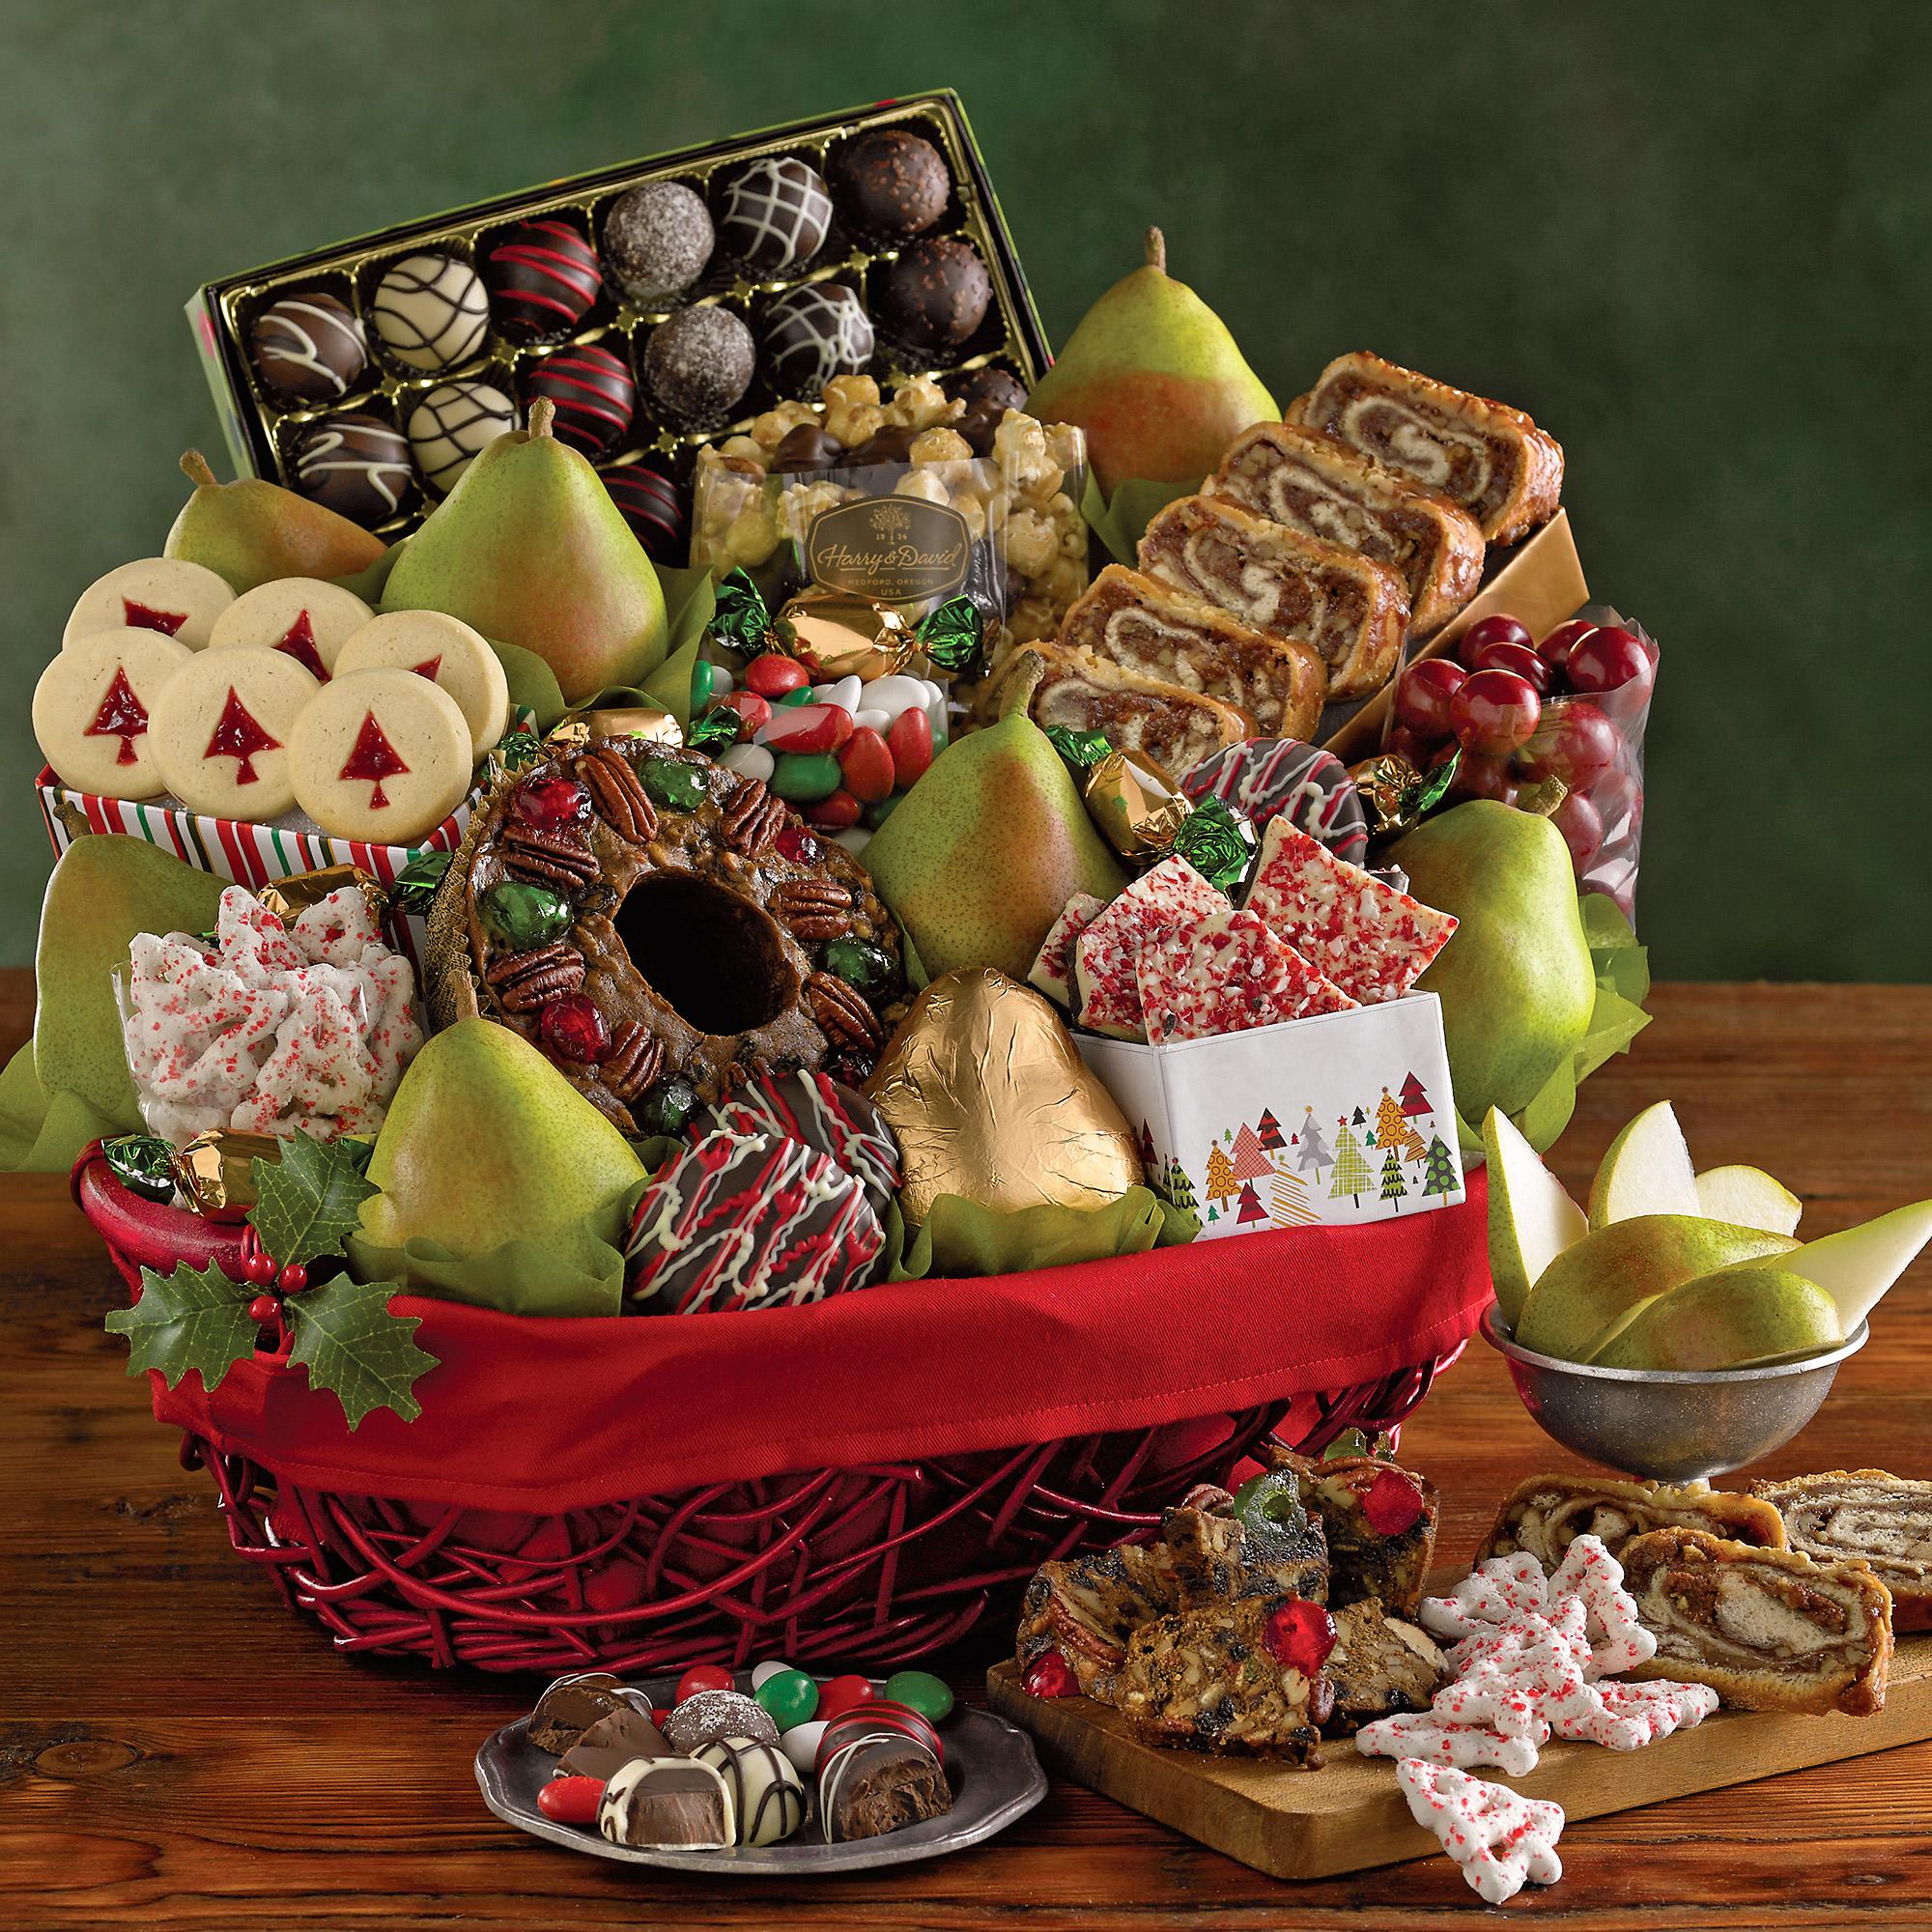 Harry And David Birthday Gift Baskets : Best harry and david christmas gifts birthday gift